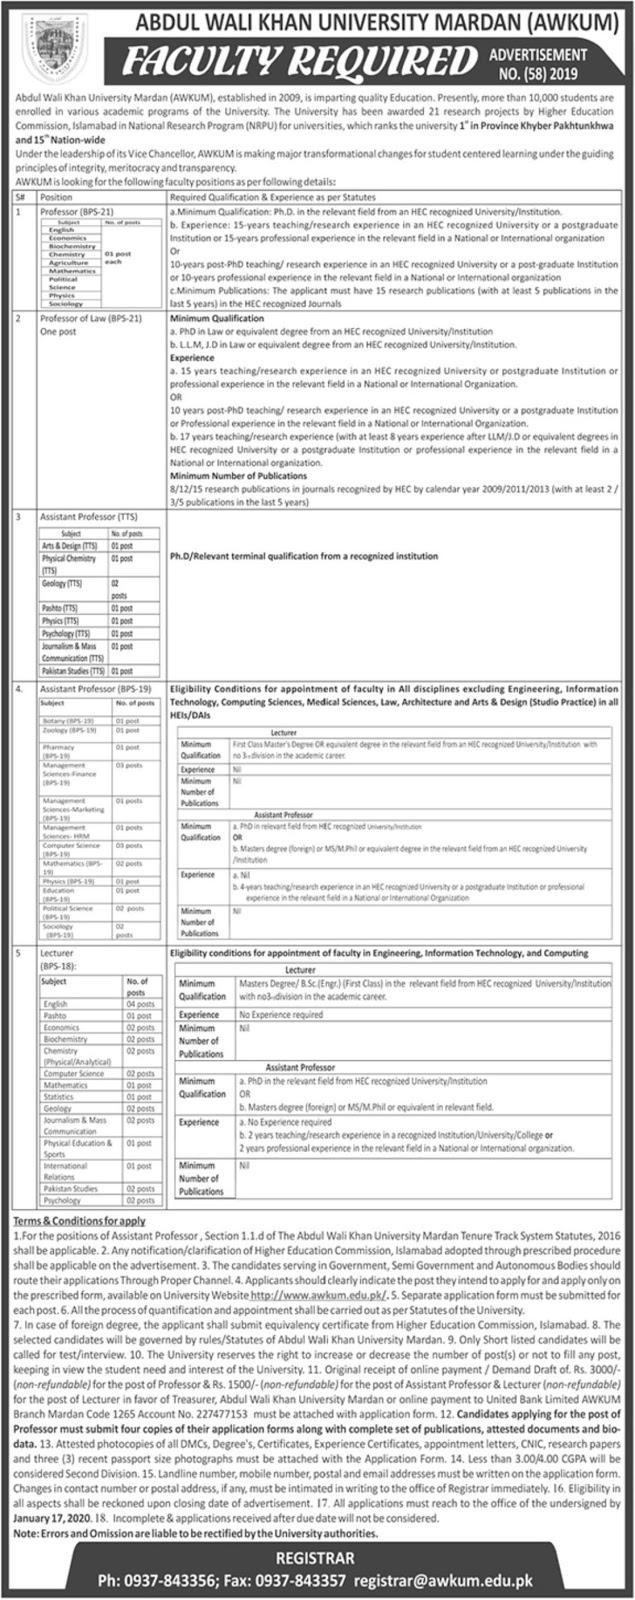 Jobs in Abdul Wali Khan University Mardan AWKUM